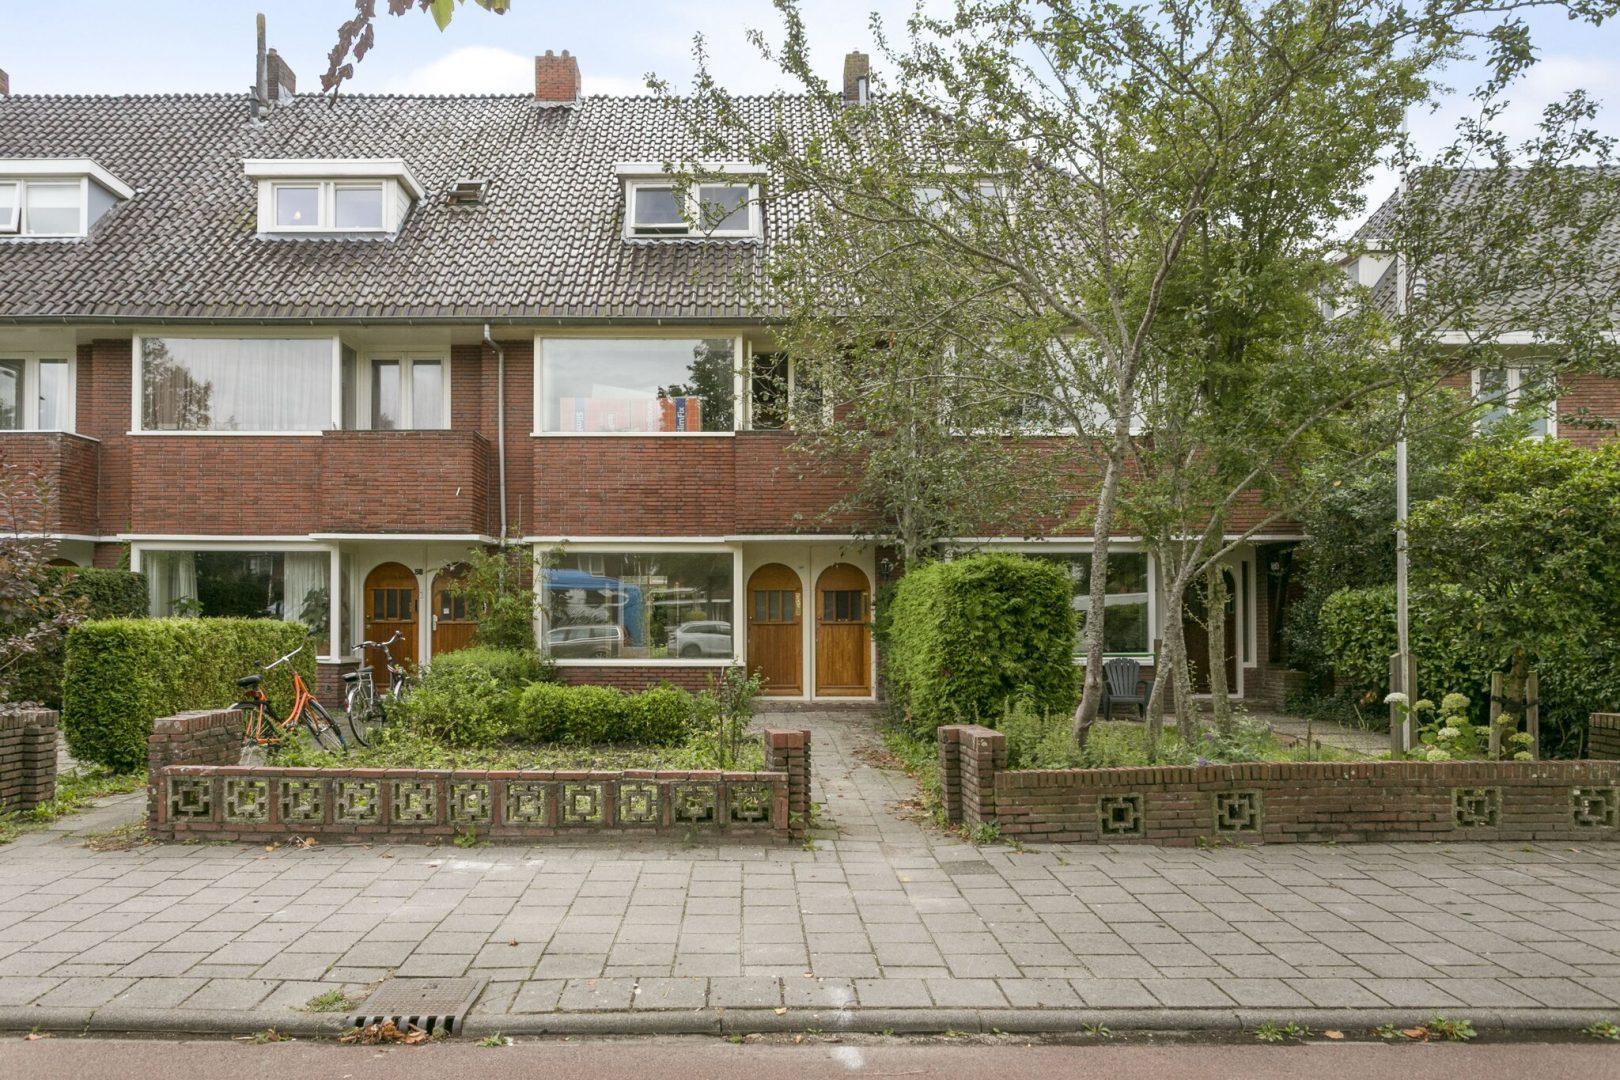 Leeuwarden – Groningerstraatweg 56